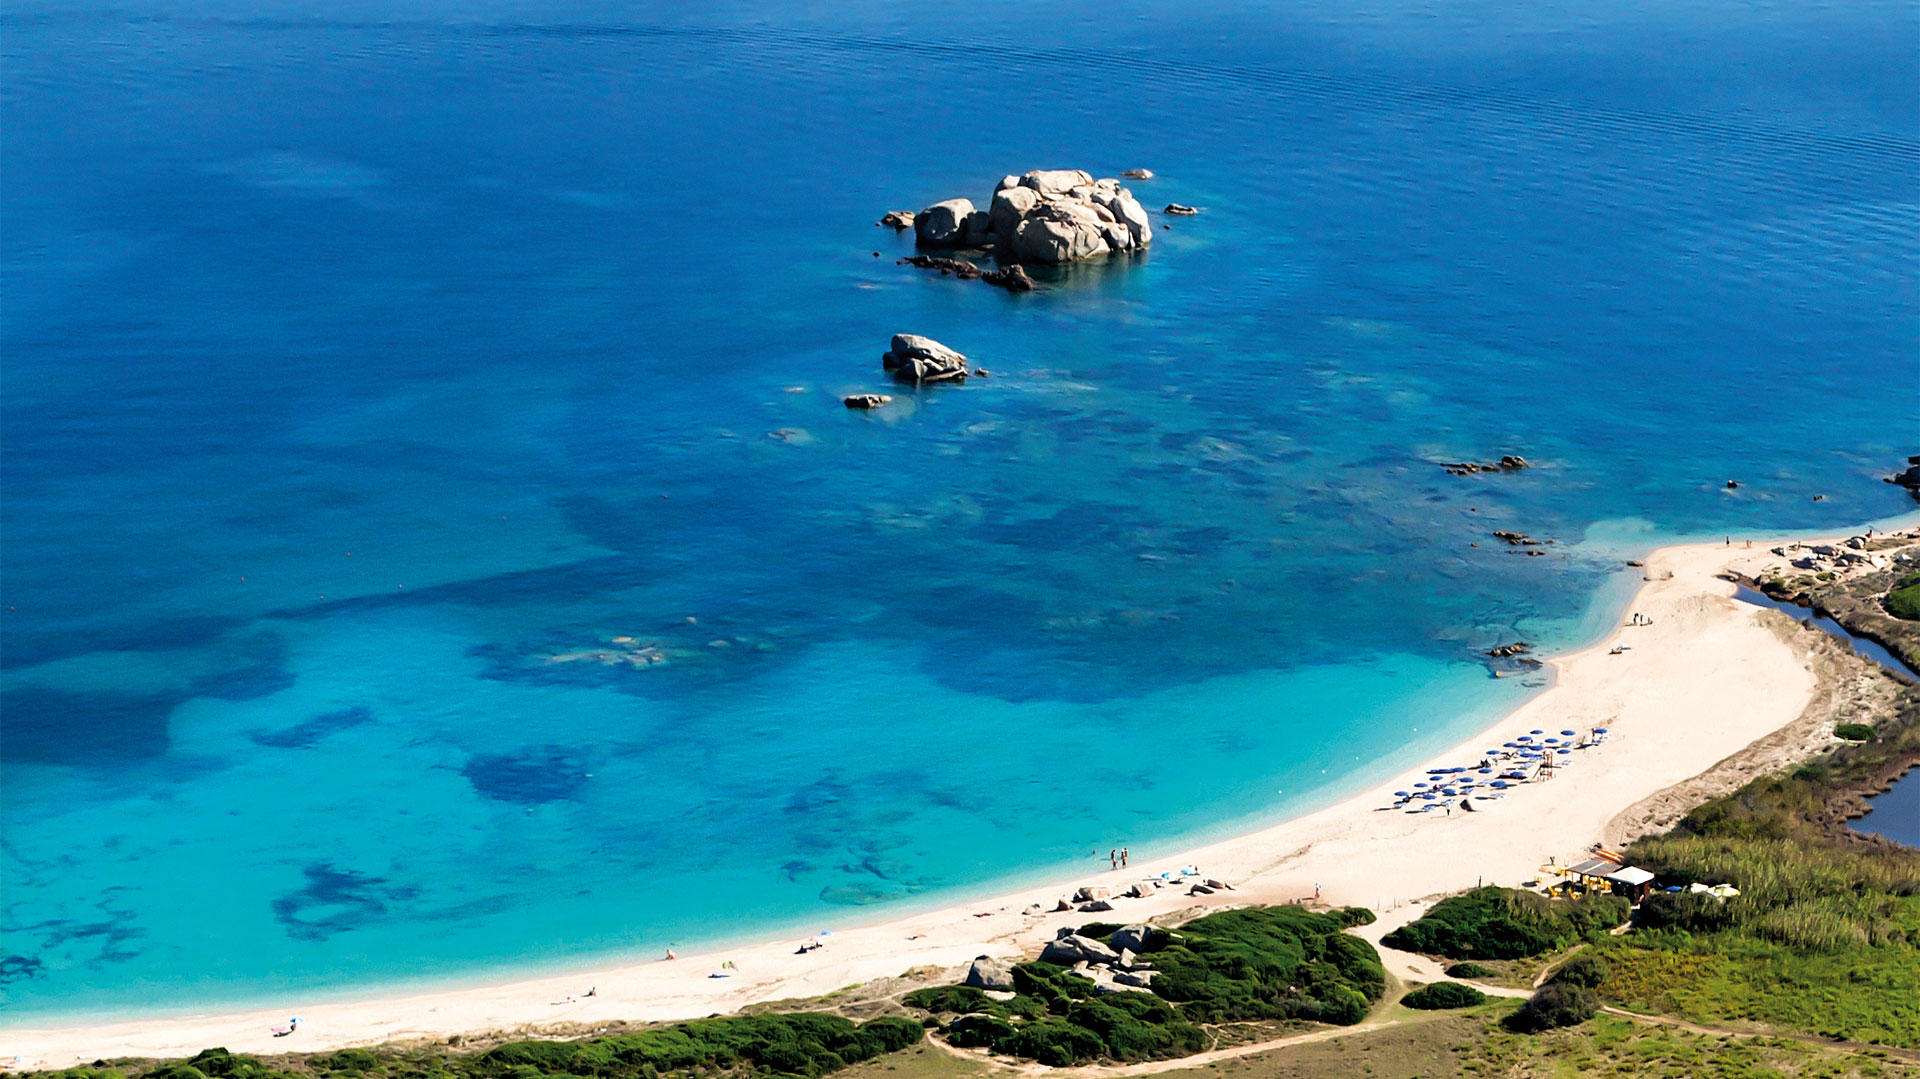 resort-valle-erica-slider-servizi-spiaggia-sardegna-mare-2